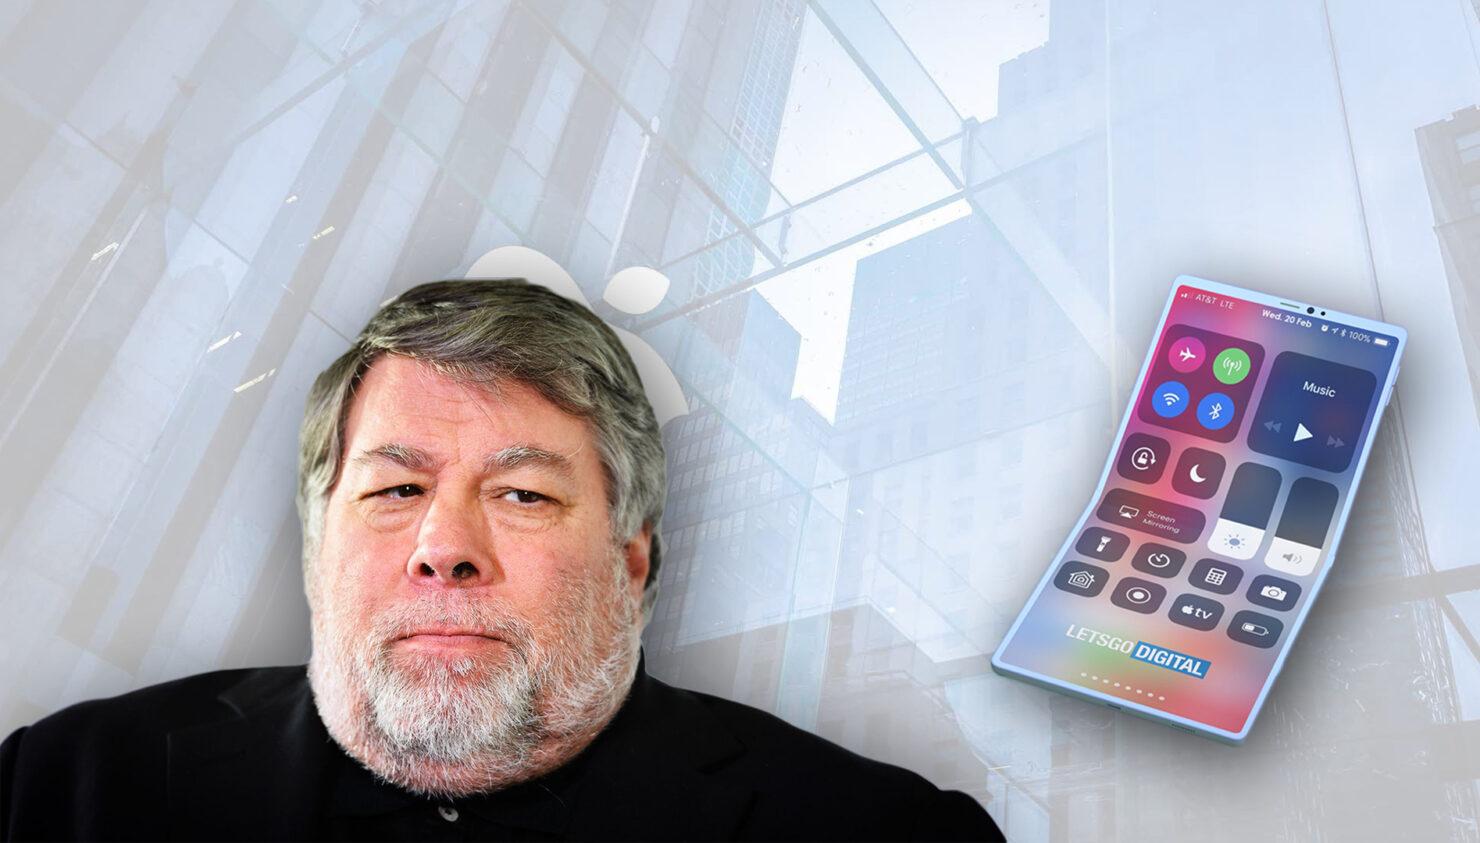 Steve Wozniak wants Apple folding iPhone